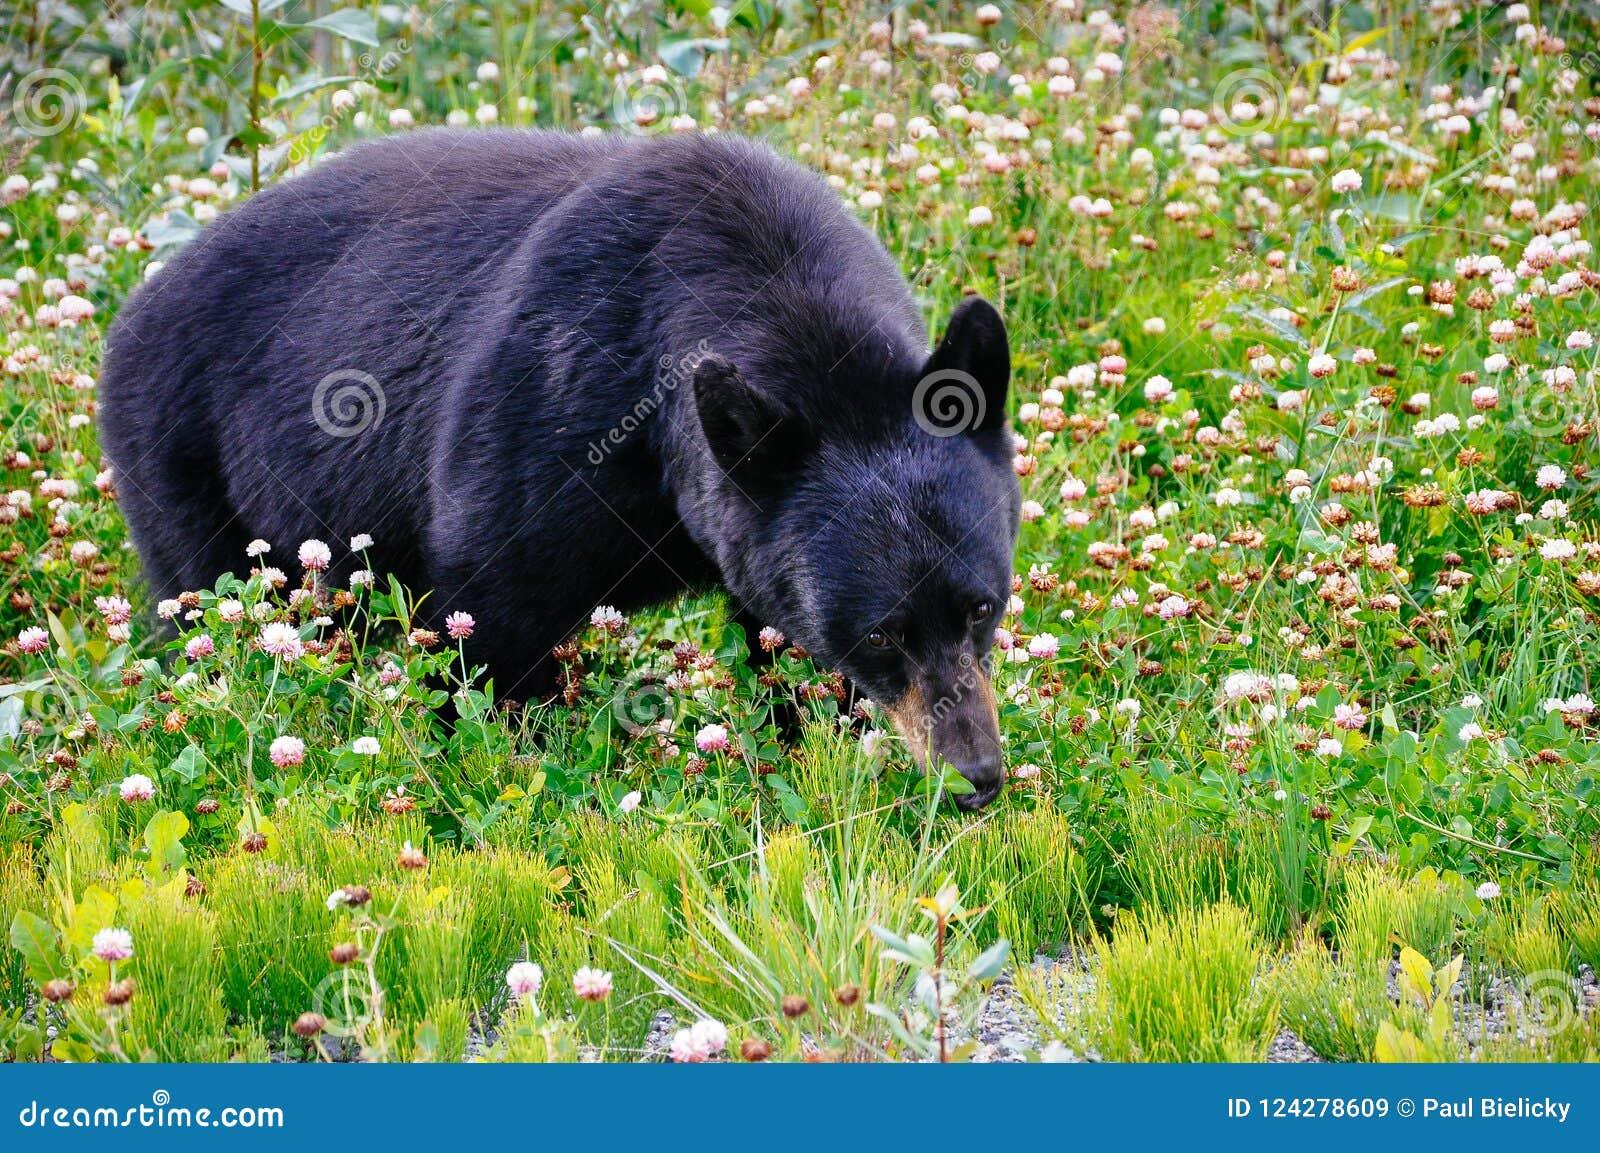 A black bear grazes in the grass near Dease Lake, British Columbia.